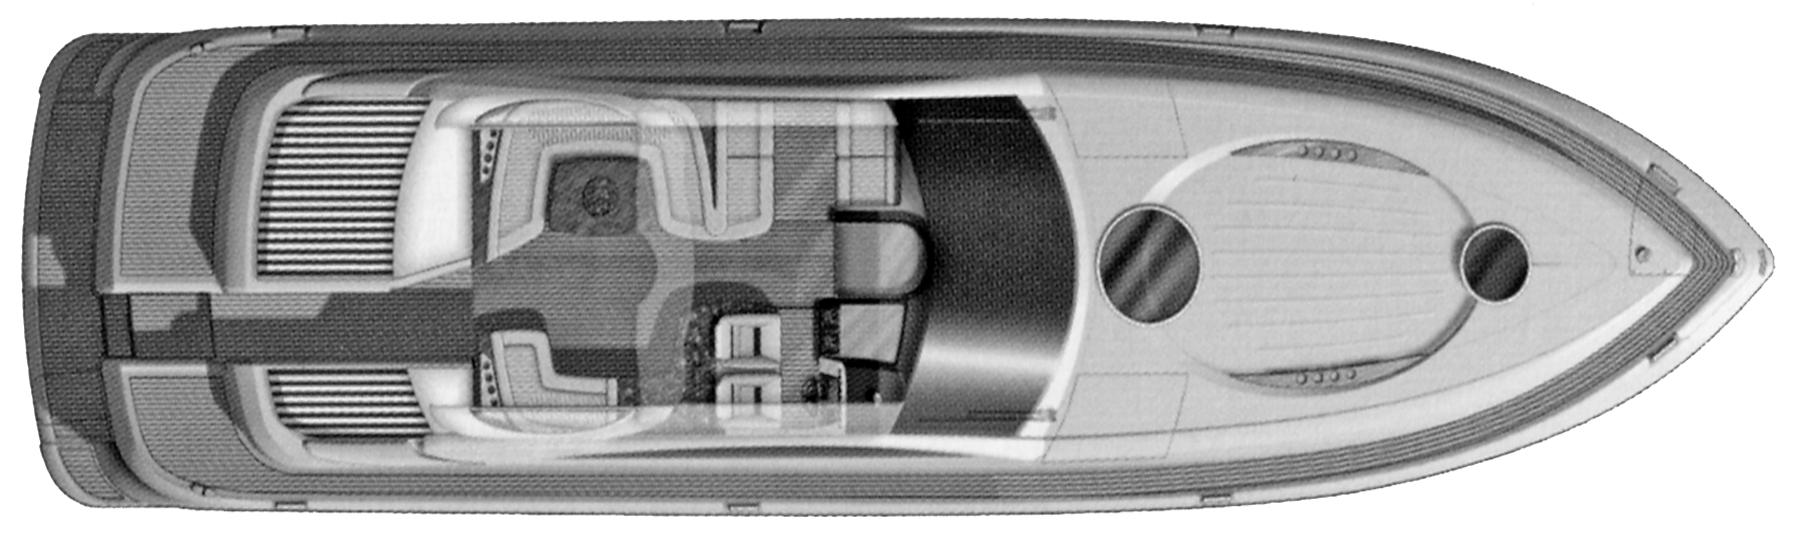 62 Targa Floor Plan 2